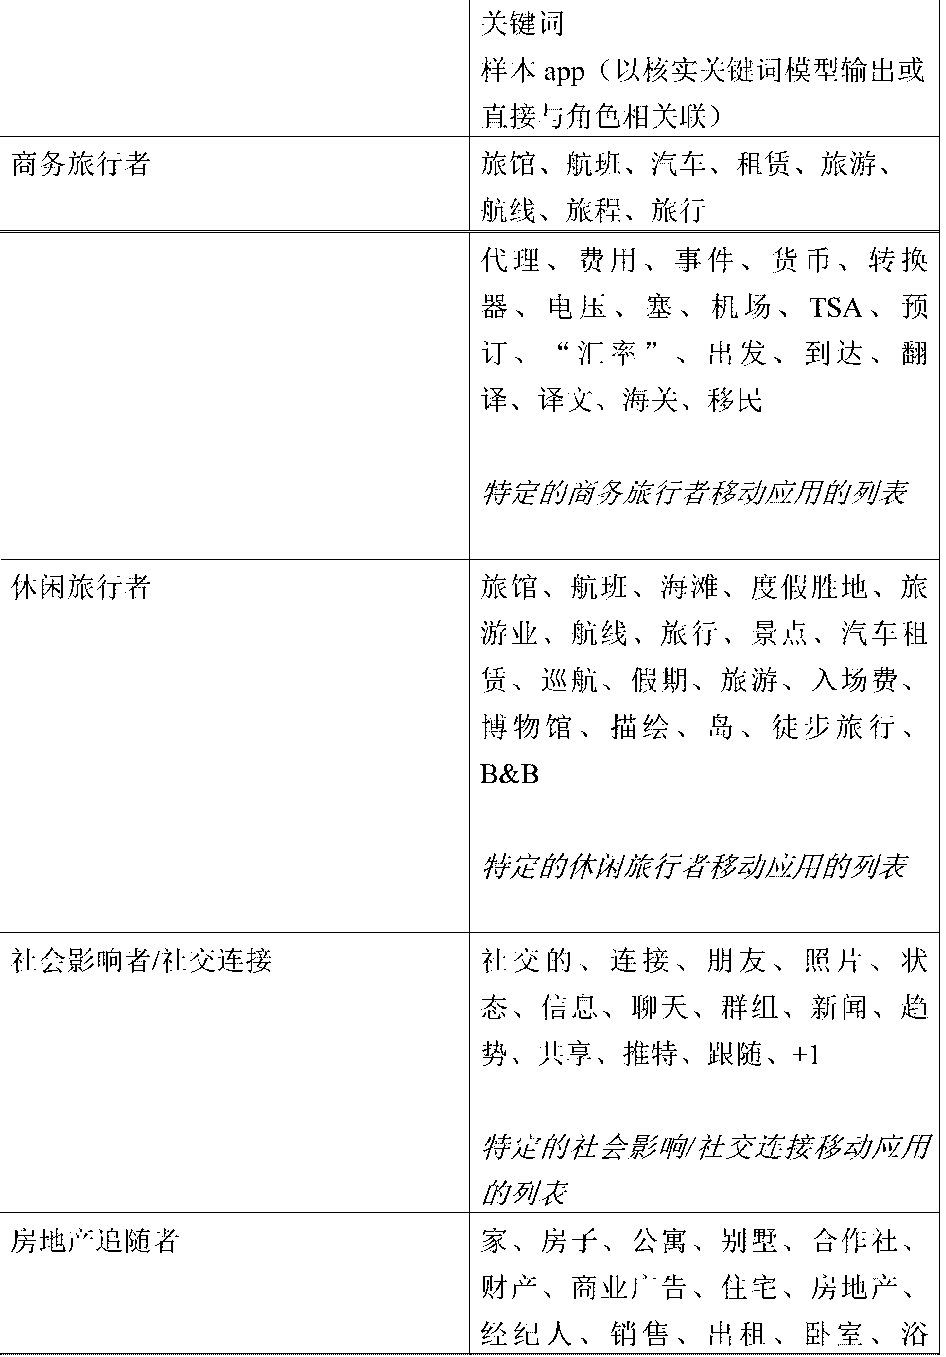 Figure CN104508694AD00211